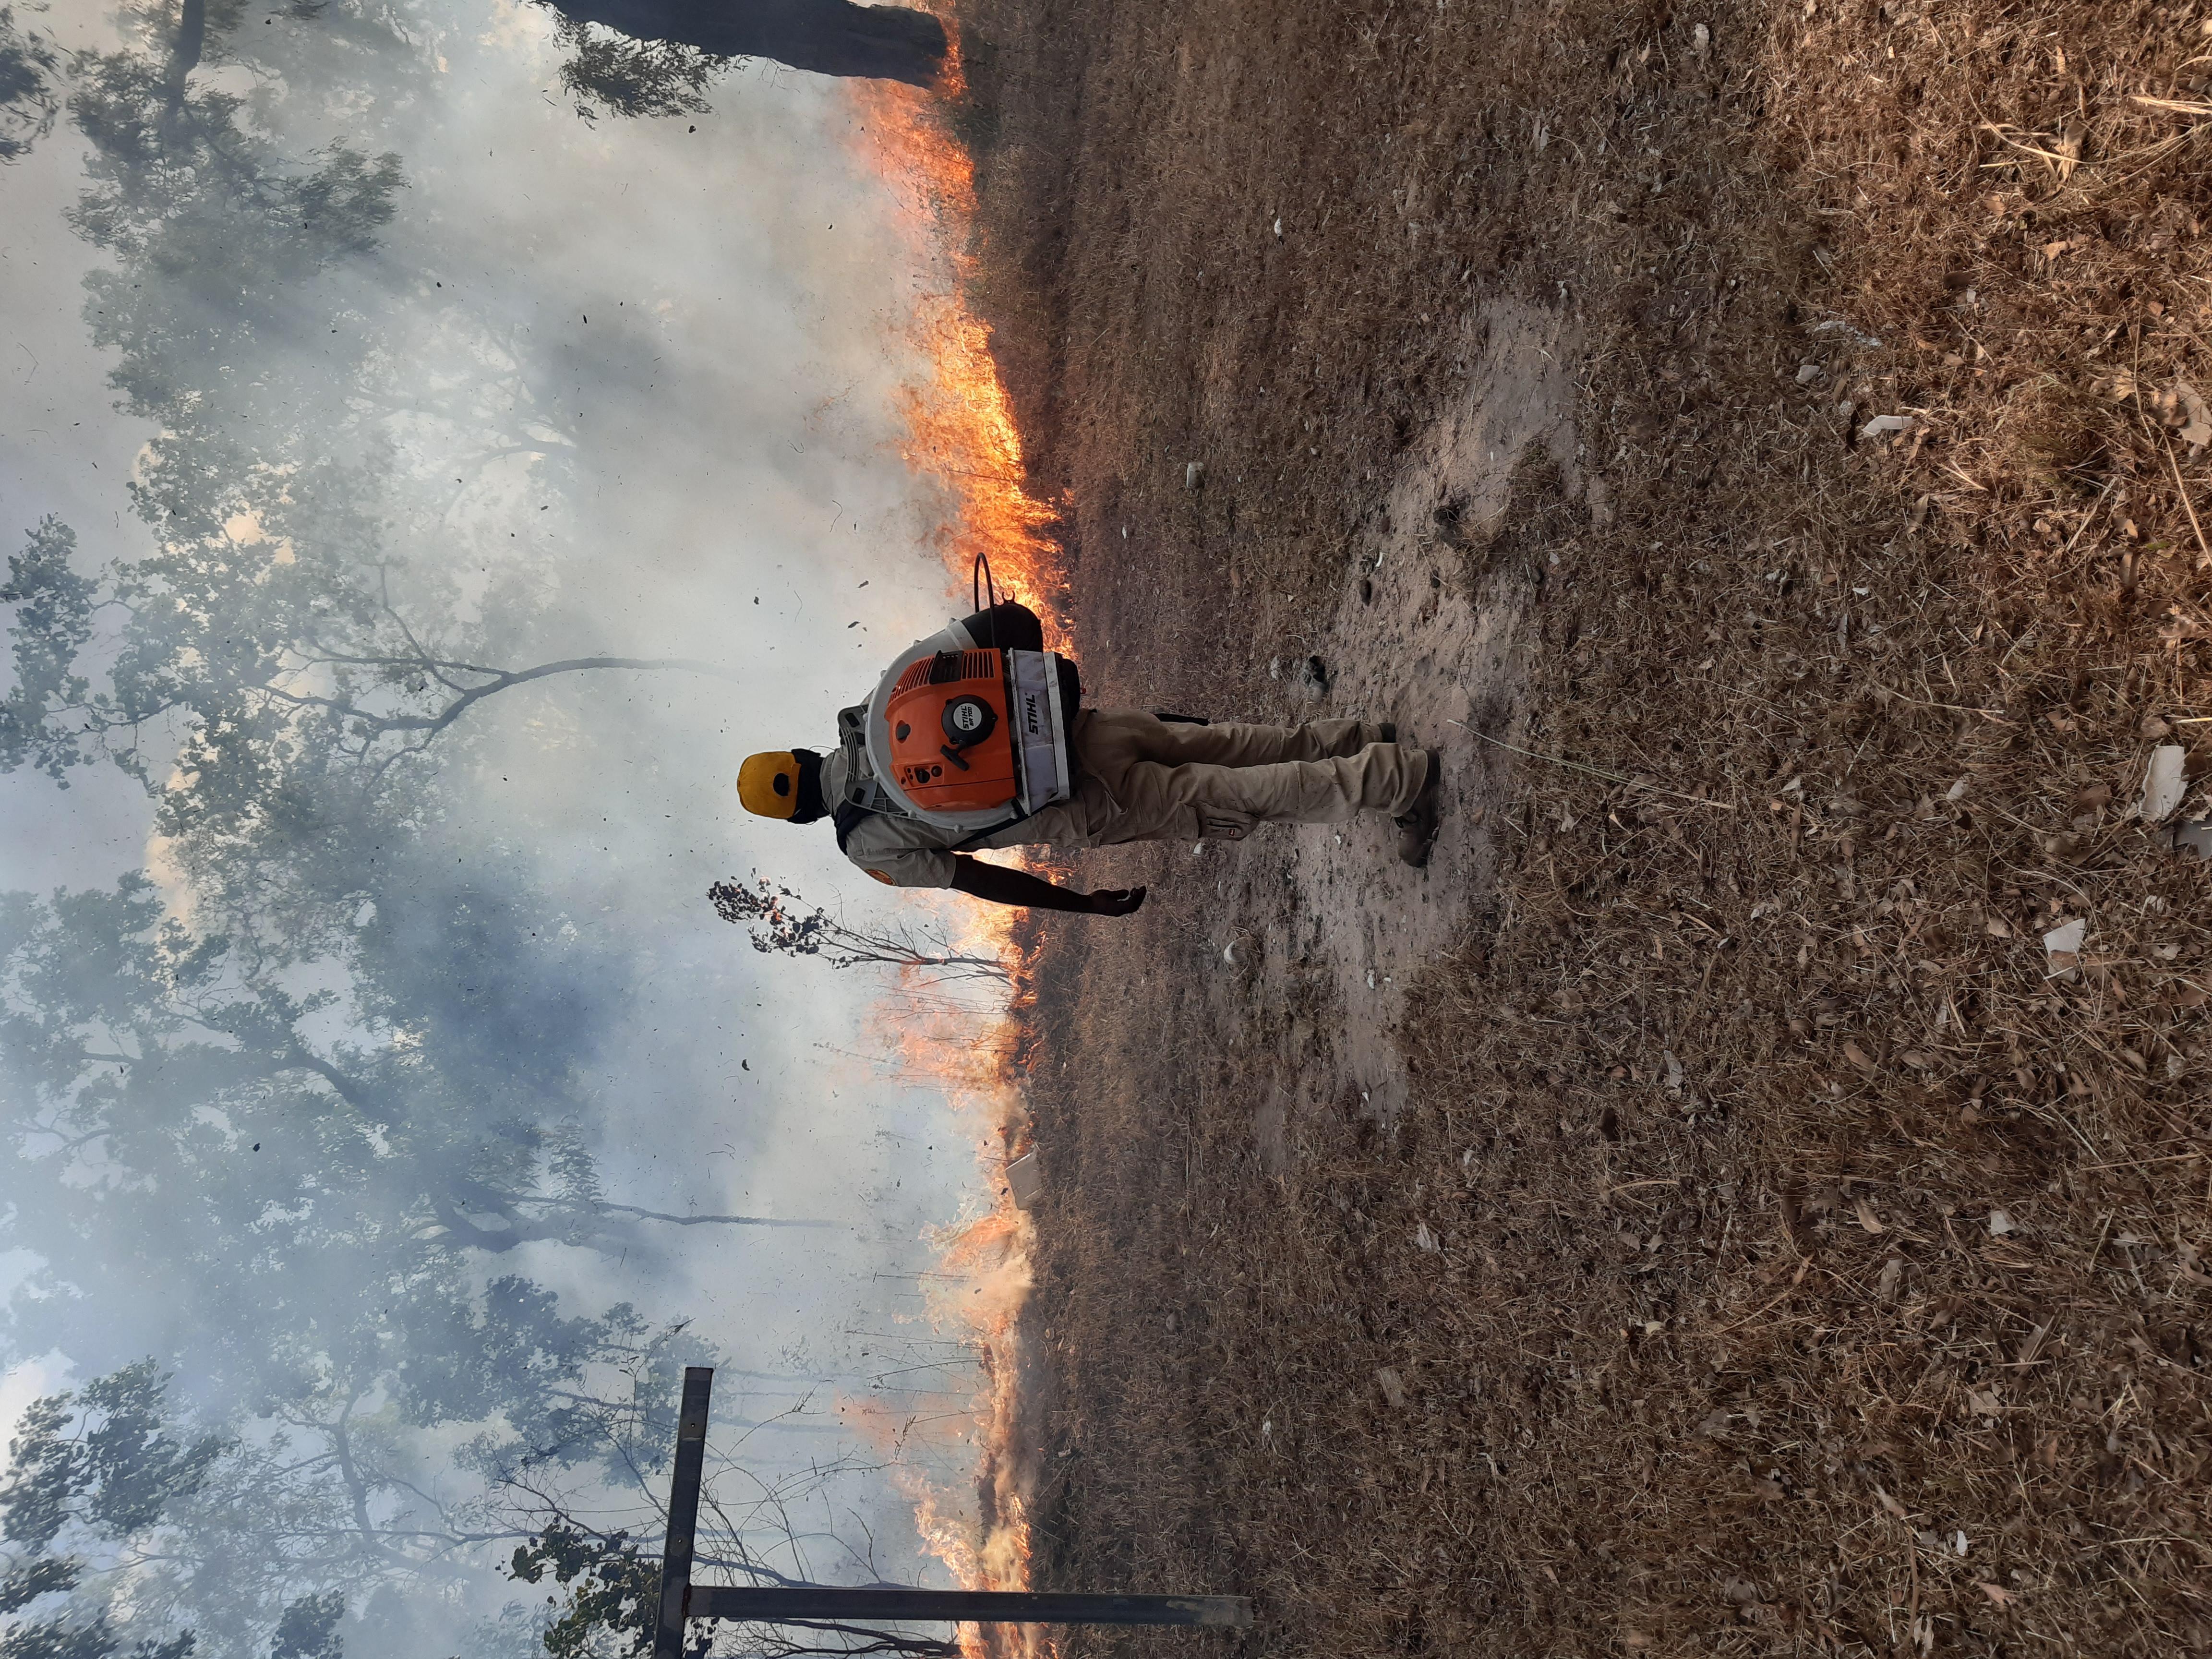 Yirralka Rangers burning near Gan Gan Laynhapuy